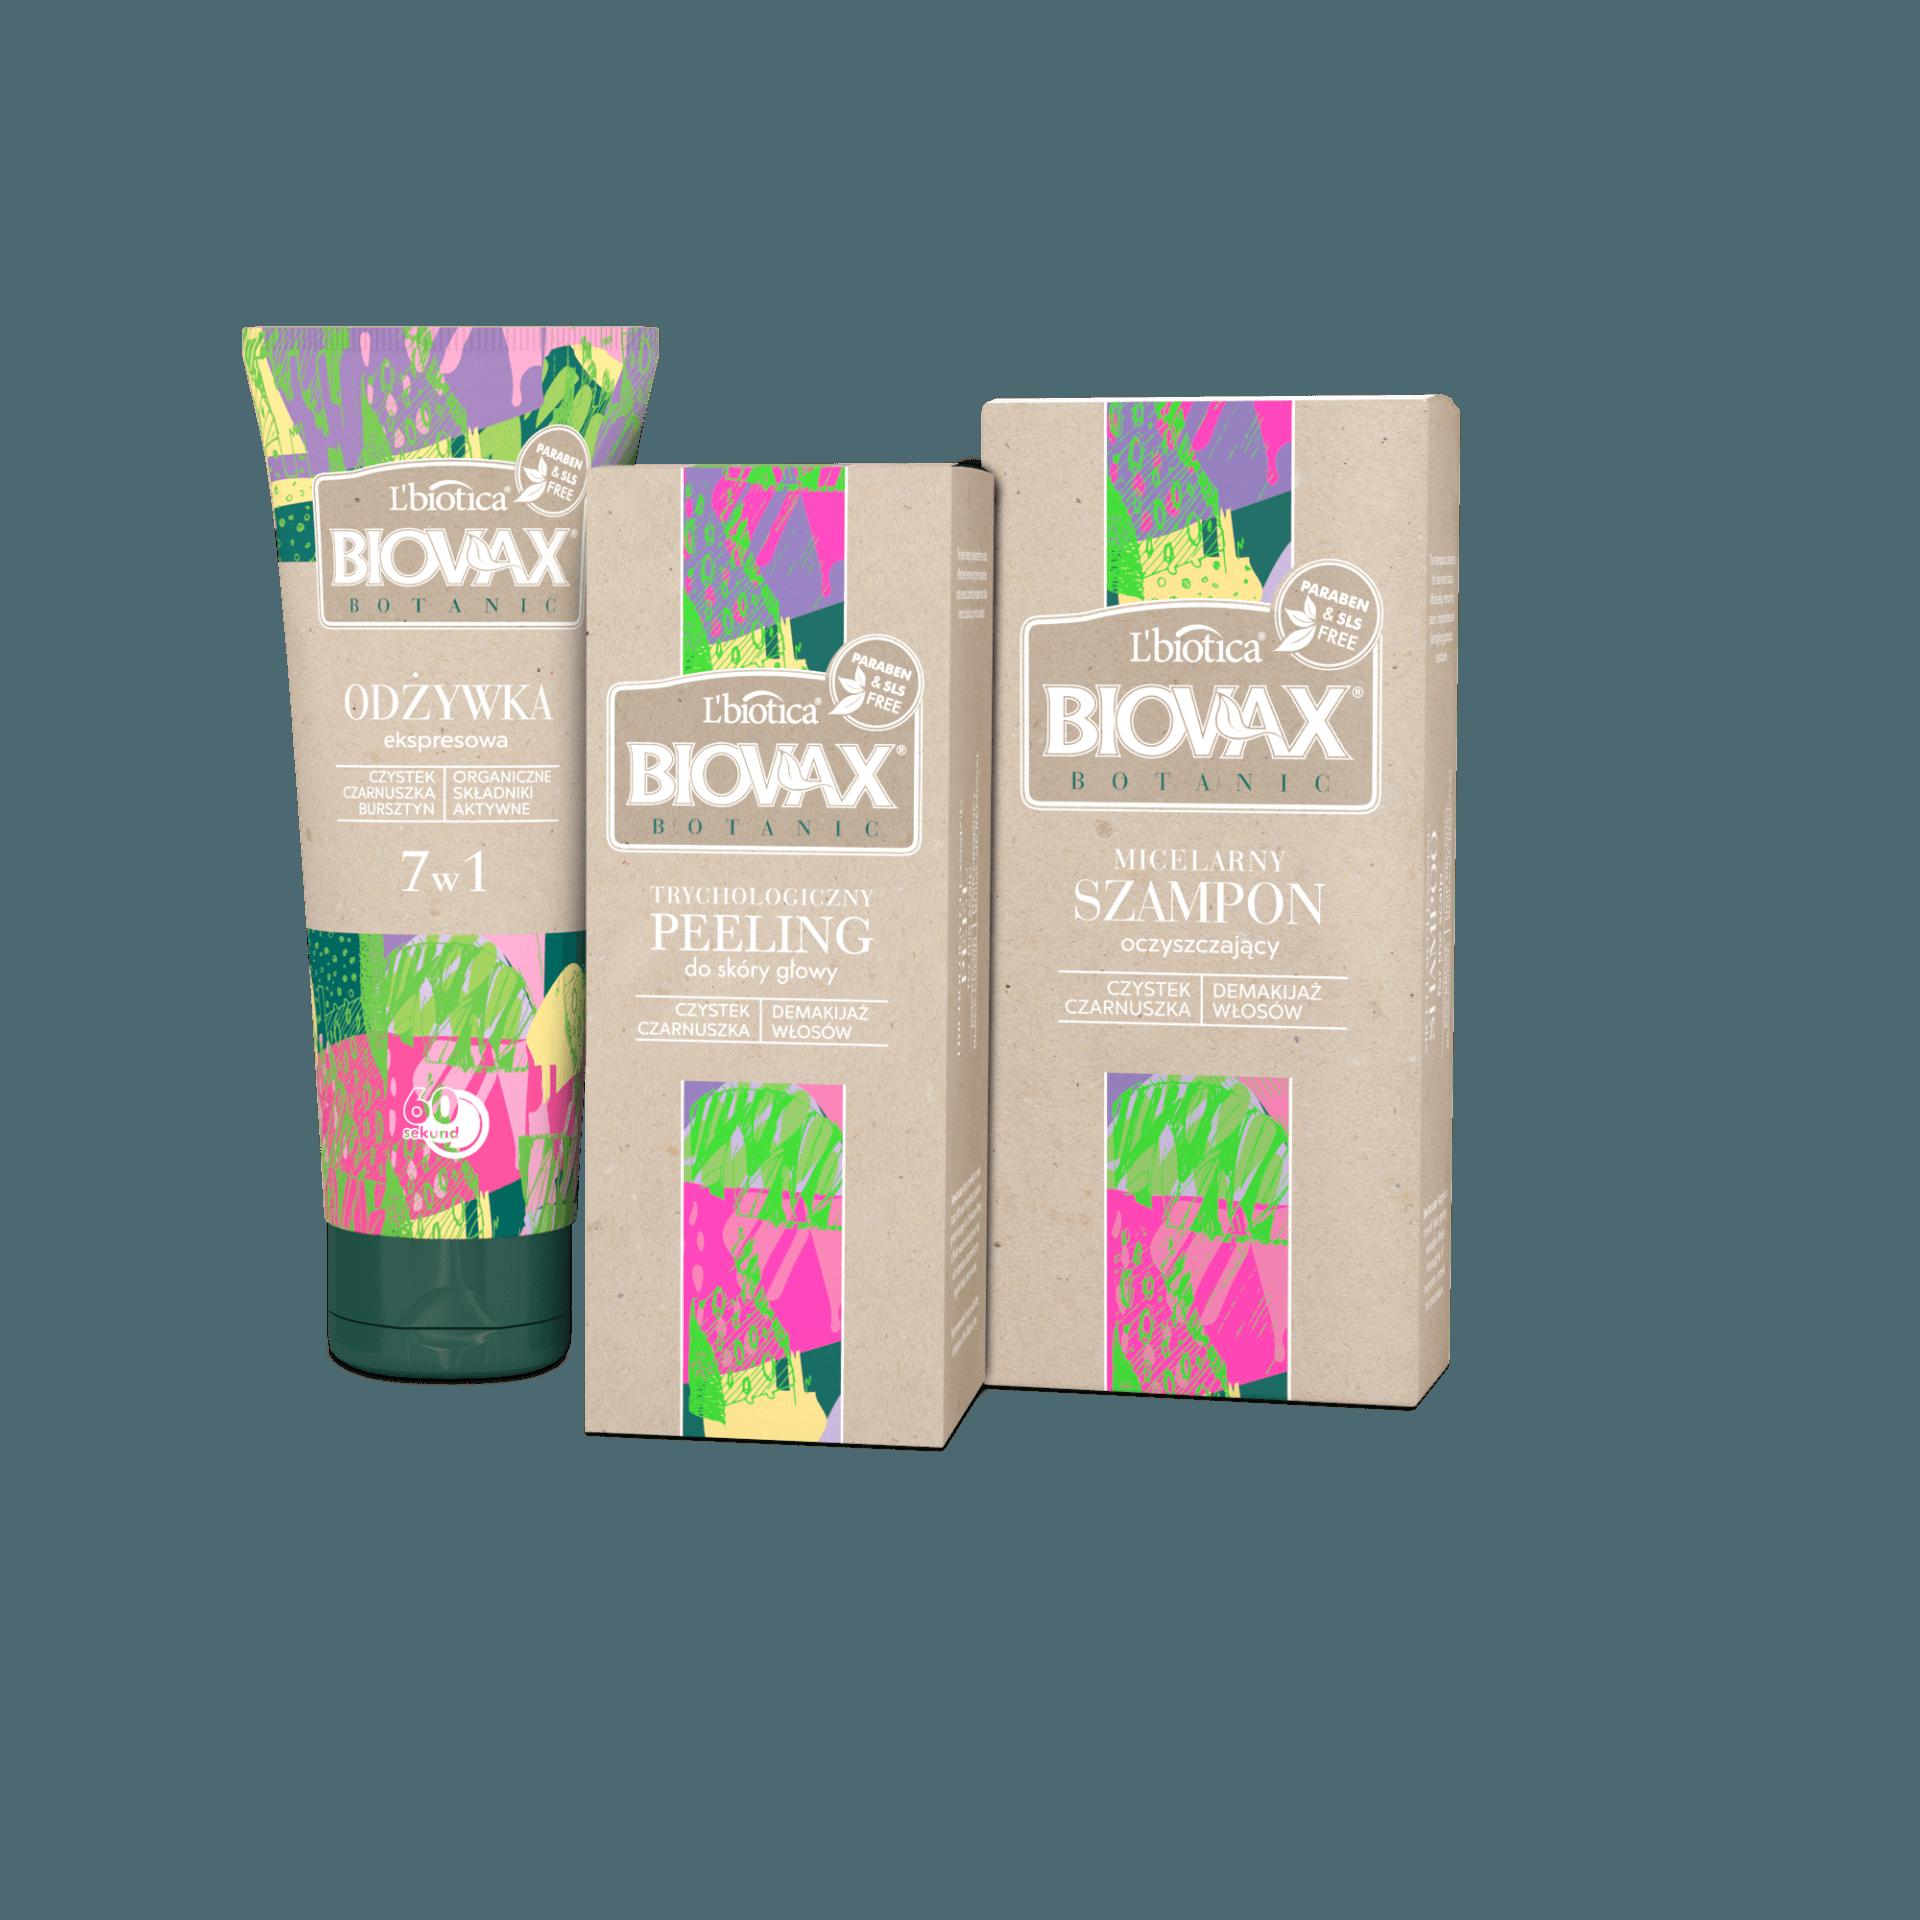 zestaw Biovax Botanic